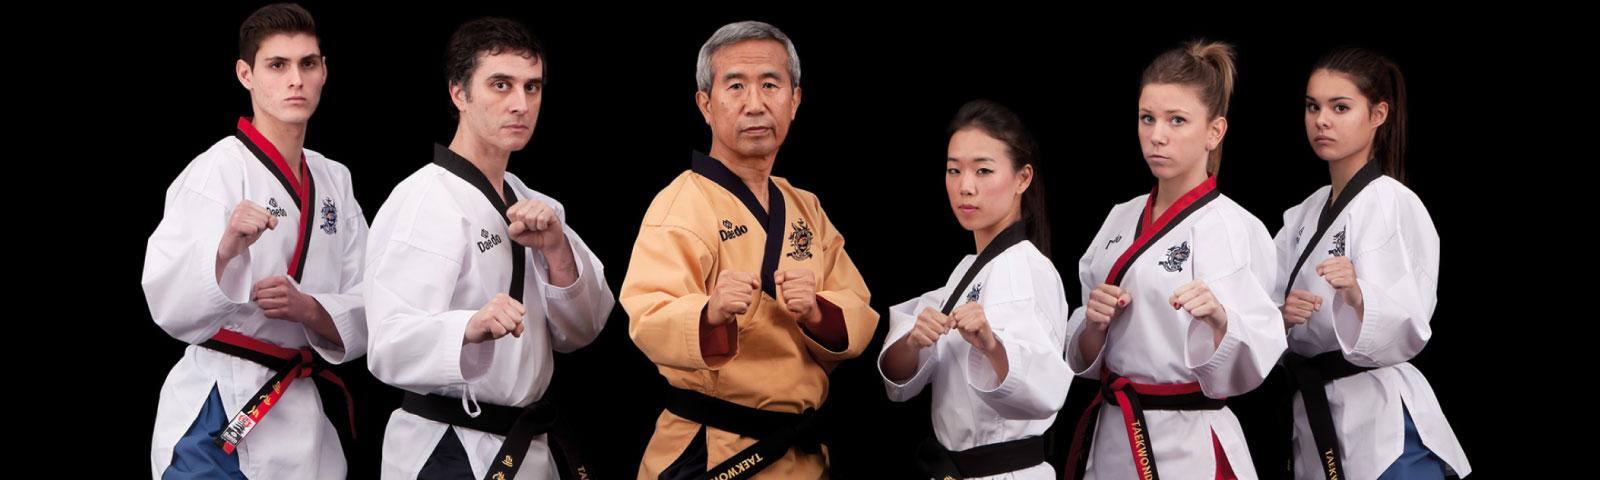 Taekwondo online-shop | Europe | Shop TKD equipment at